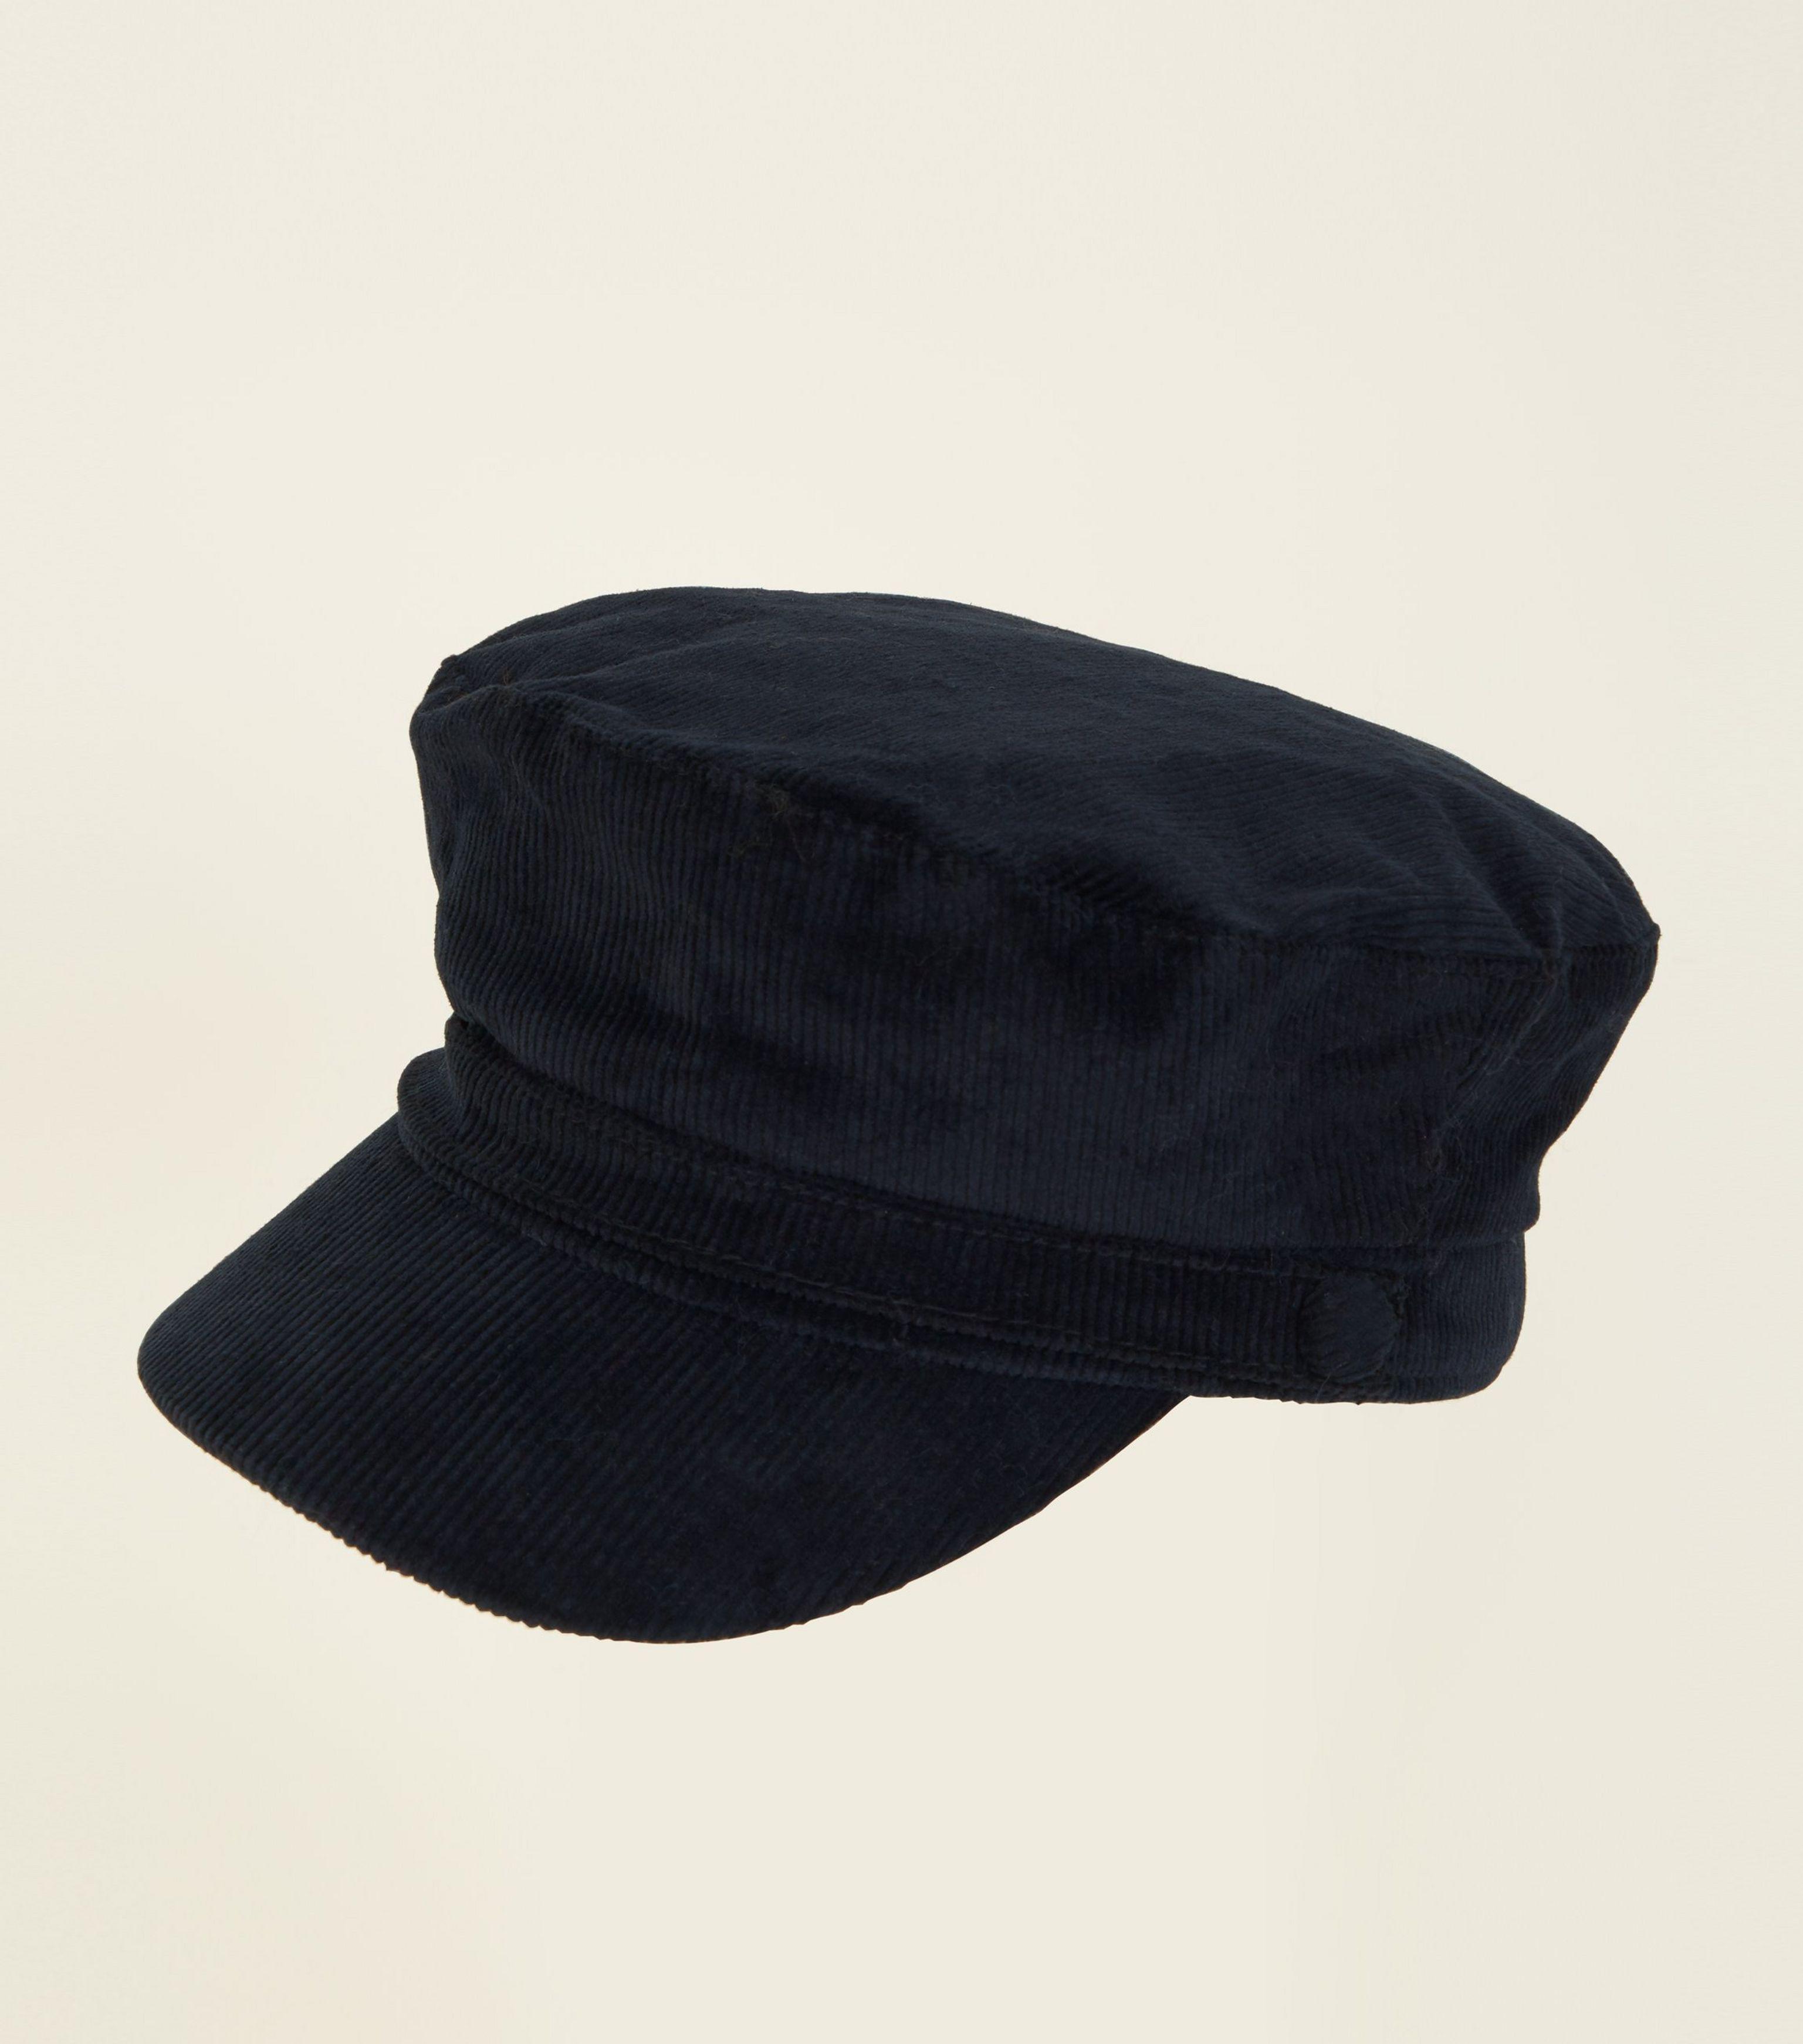 3bec70bfcd7 New Look Black Corduroy Military Baker Boy Cap in Black - Lyst